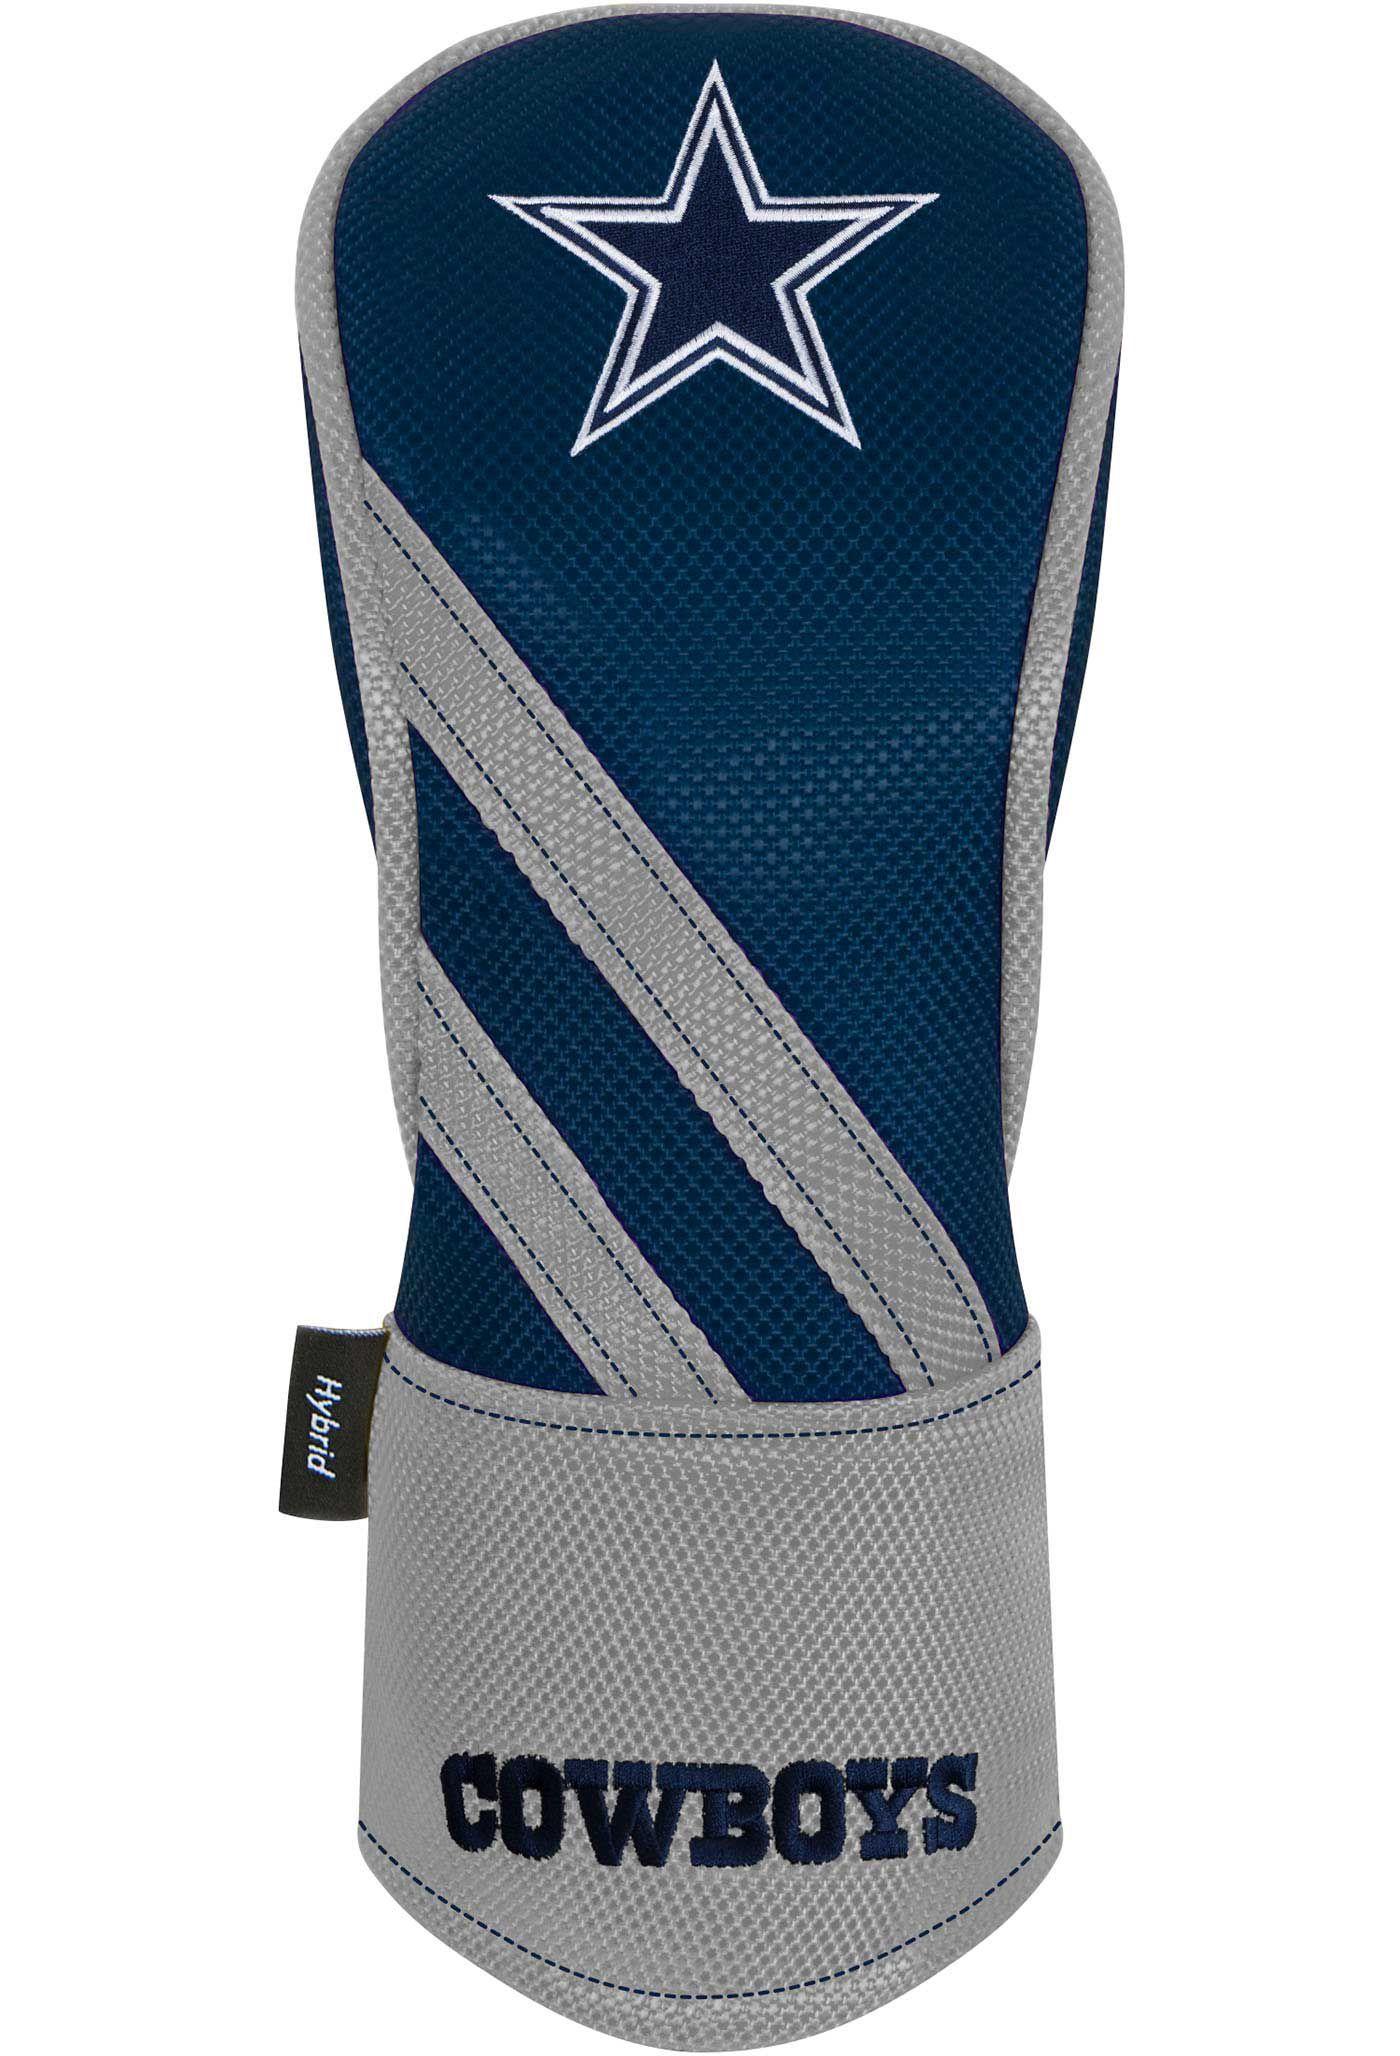 Team Effort Dallas Cowboys Hybrid Headcover